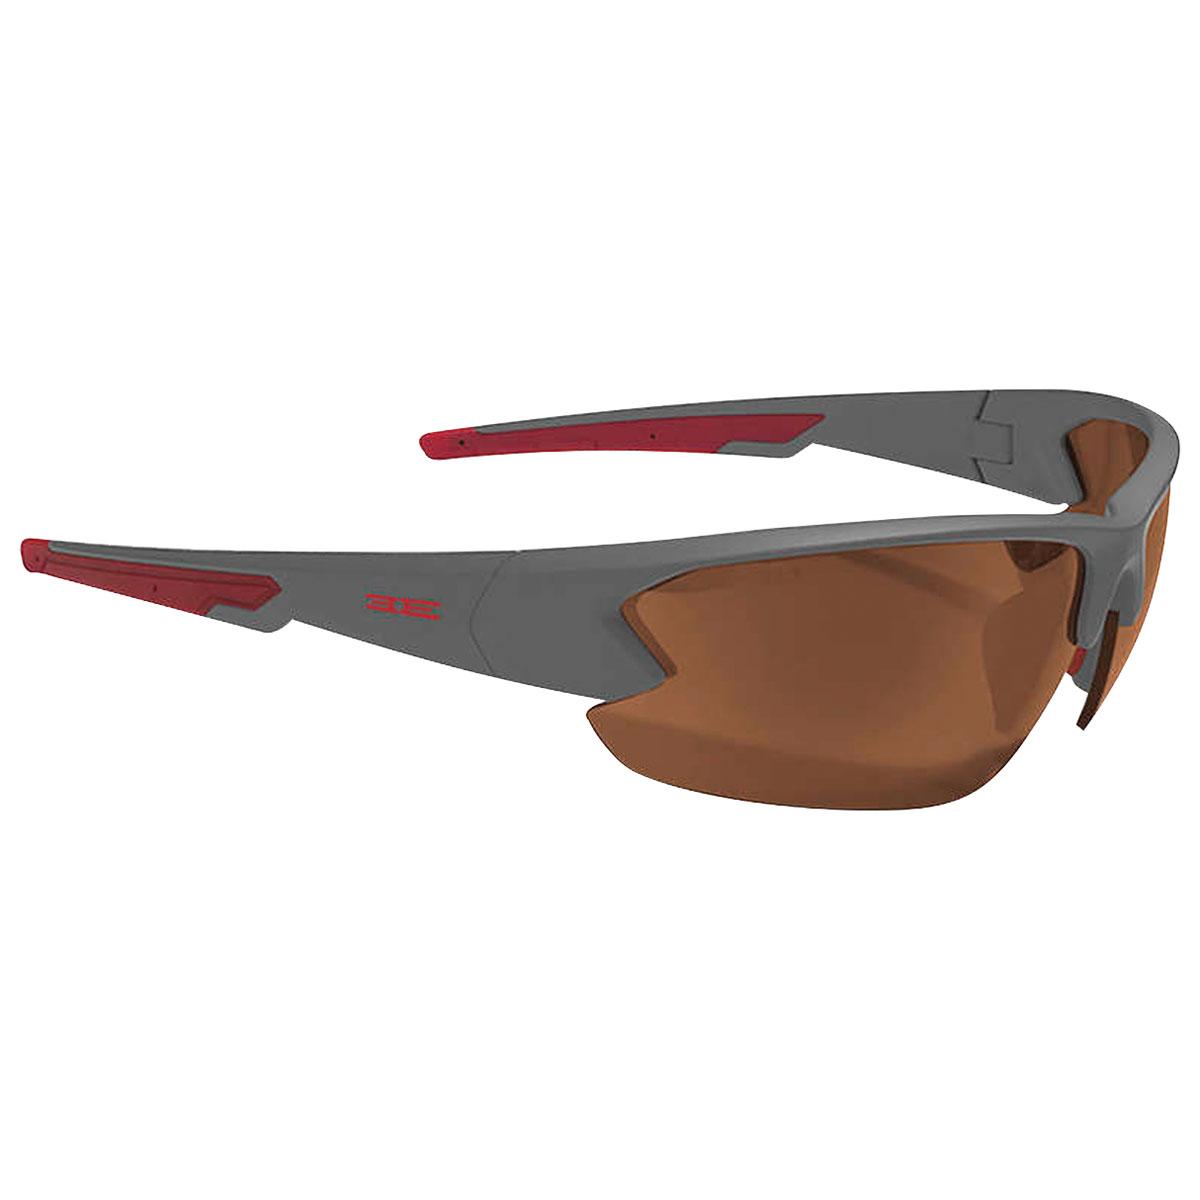 Epoch Eyewear Epoch 4 Gray Sunglasses with Amber Lens